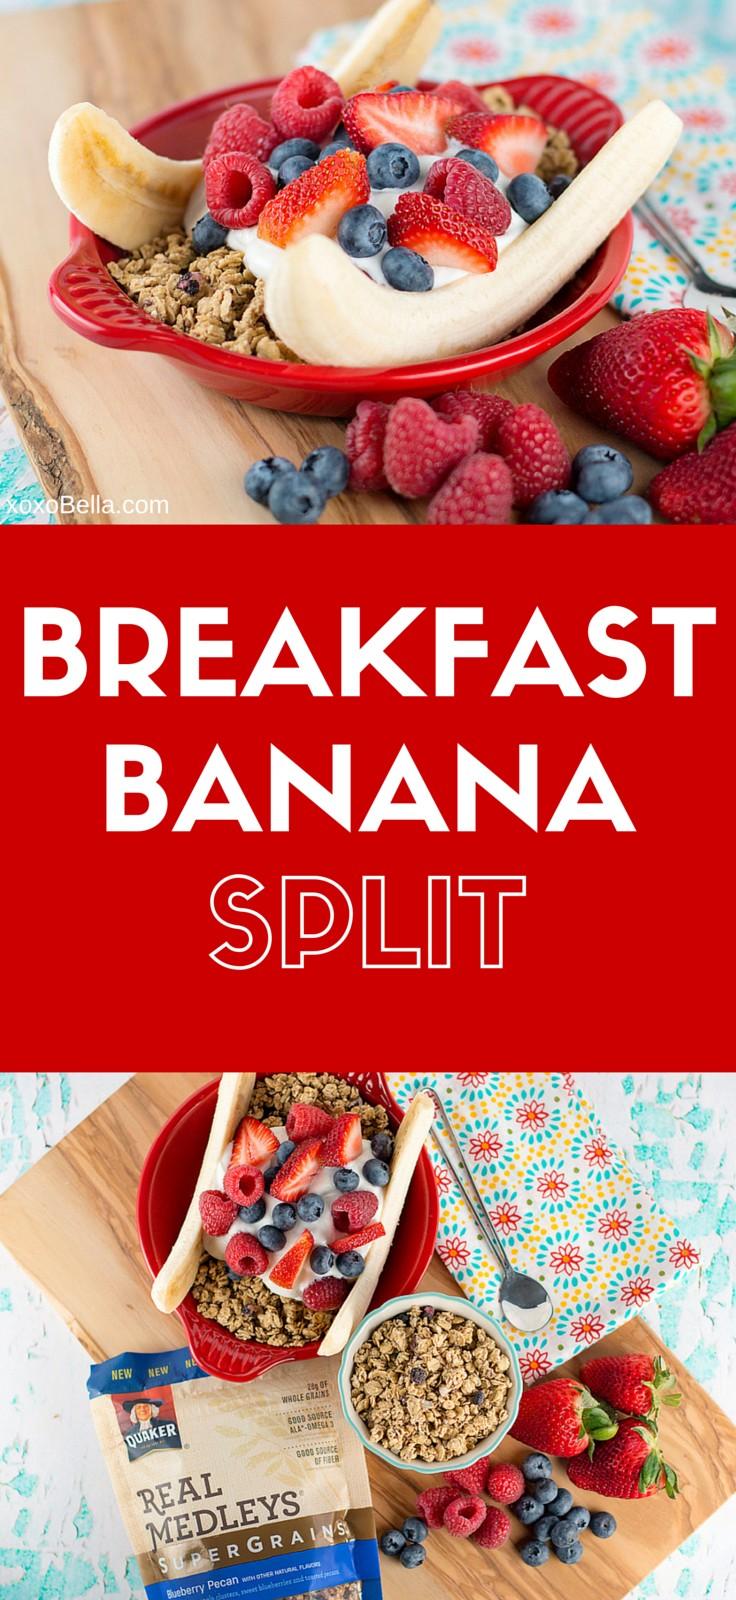 Breakfast Banana Split with Quaker Real Medleys Supergrains Granola